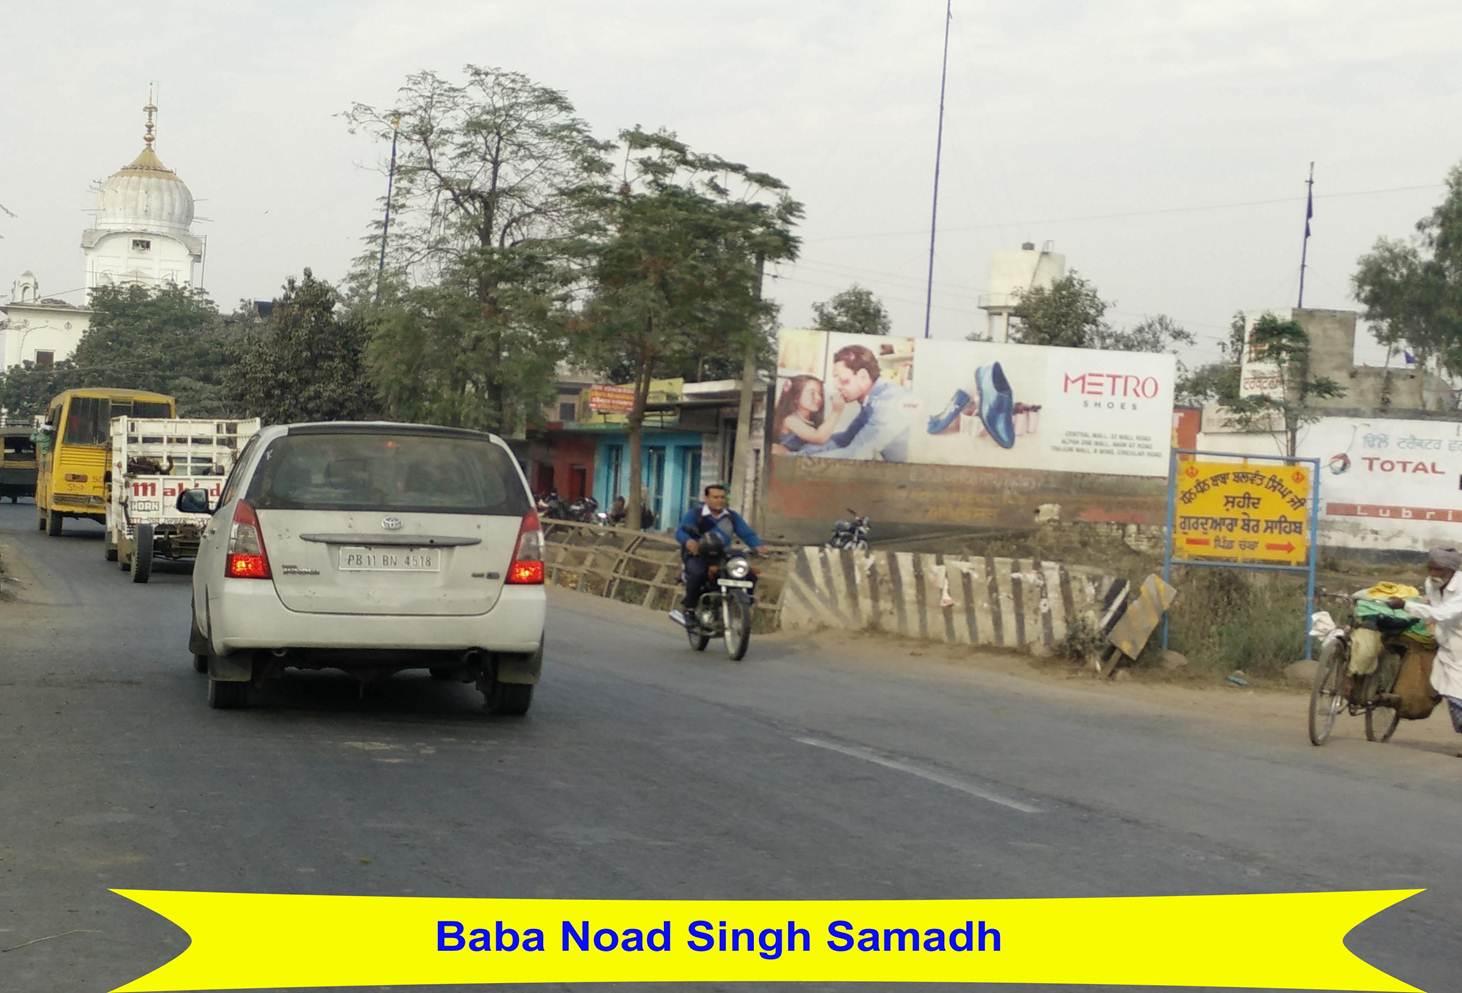 Gurdwara Baba Noad Singh Smadh, Amritsar